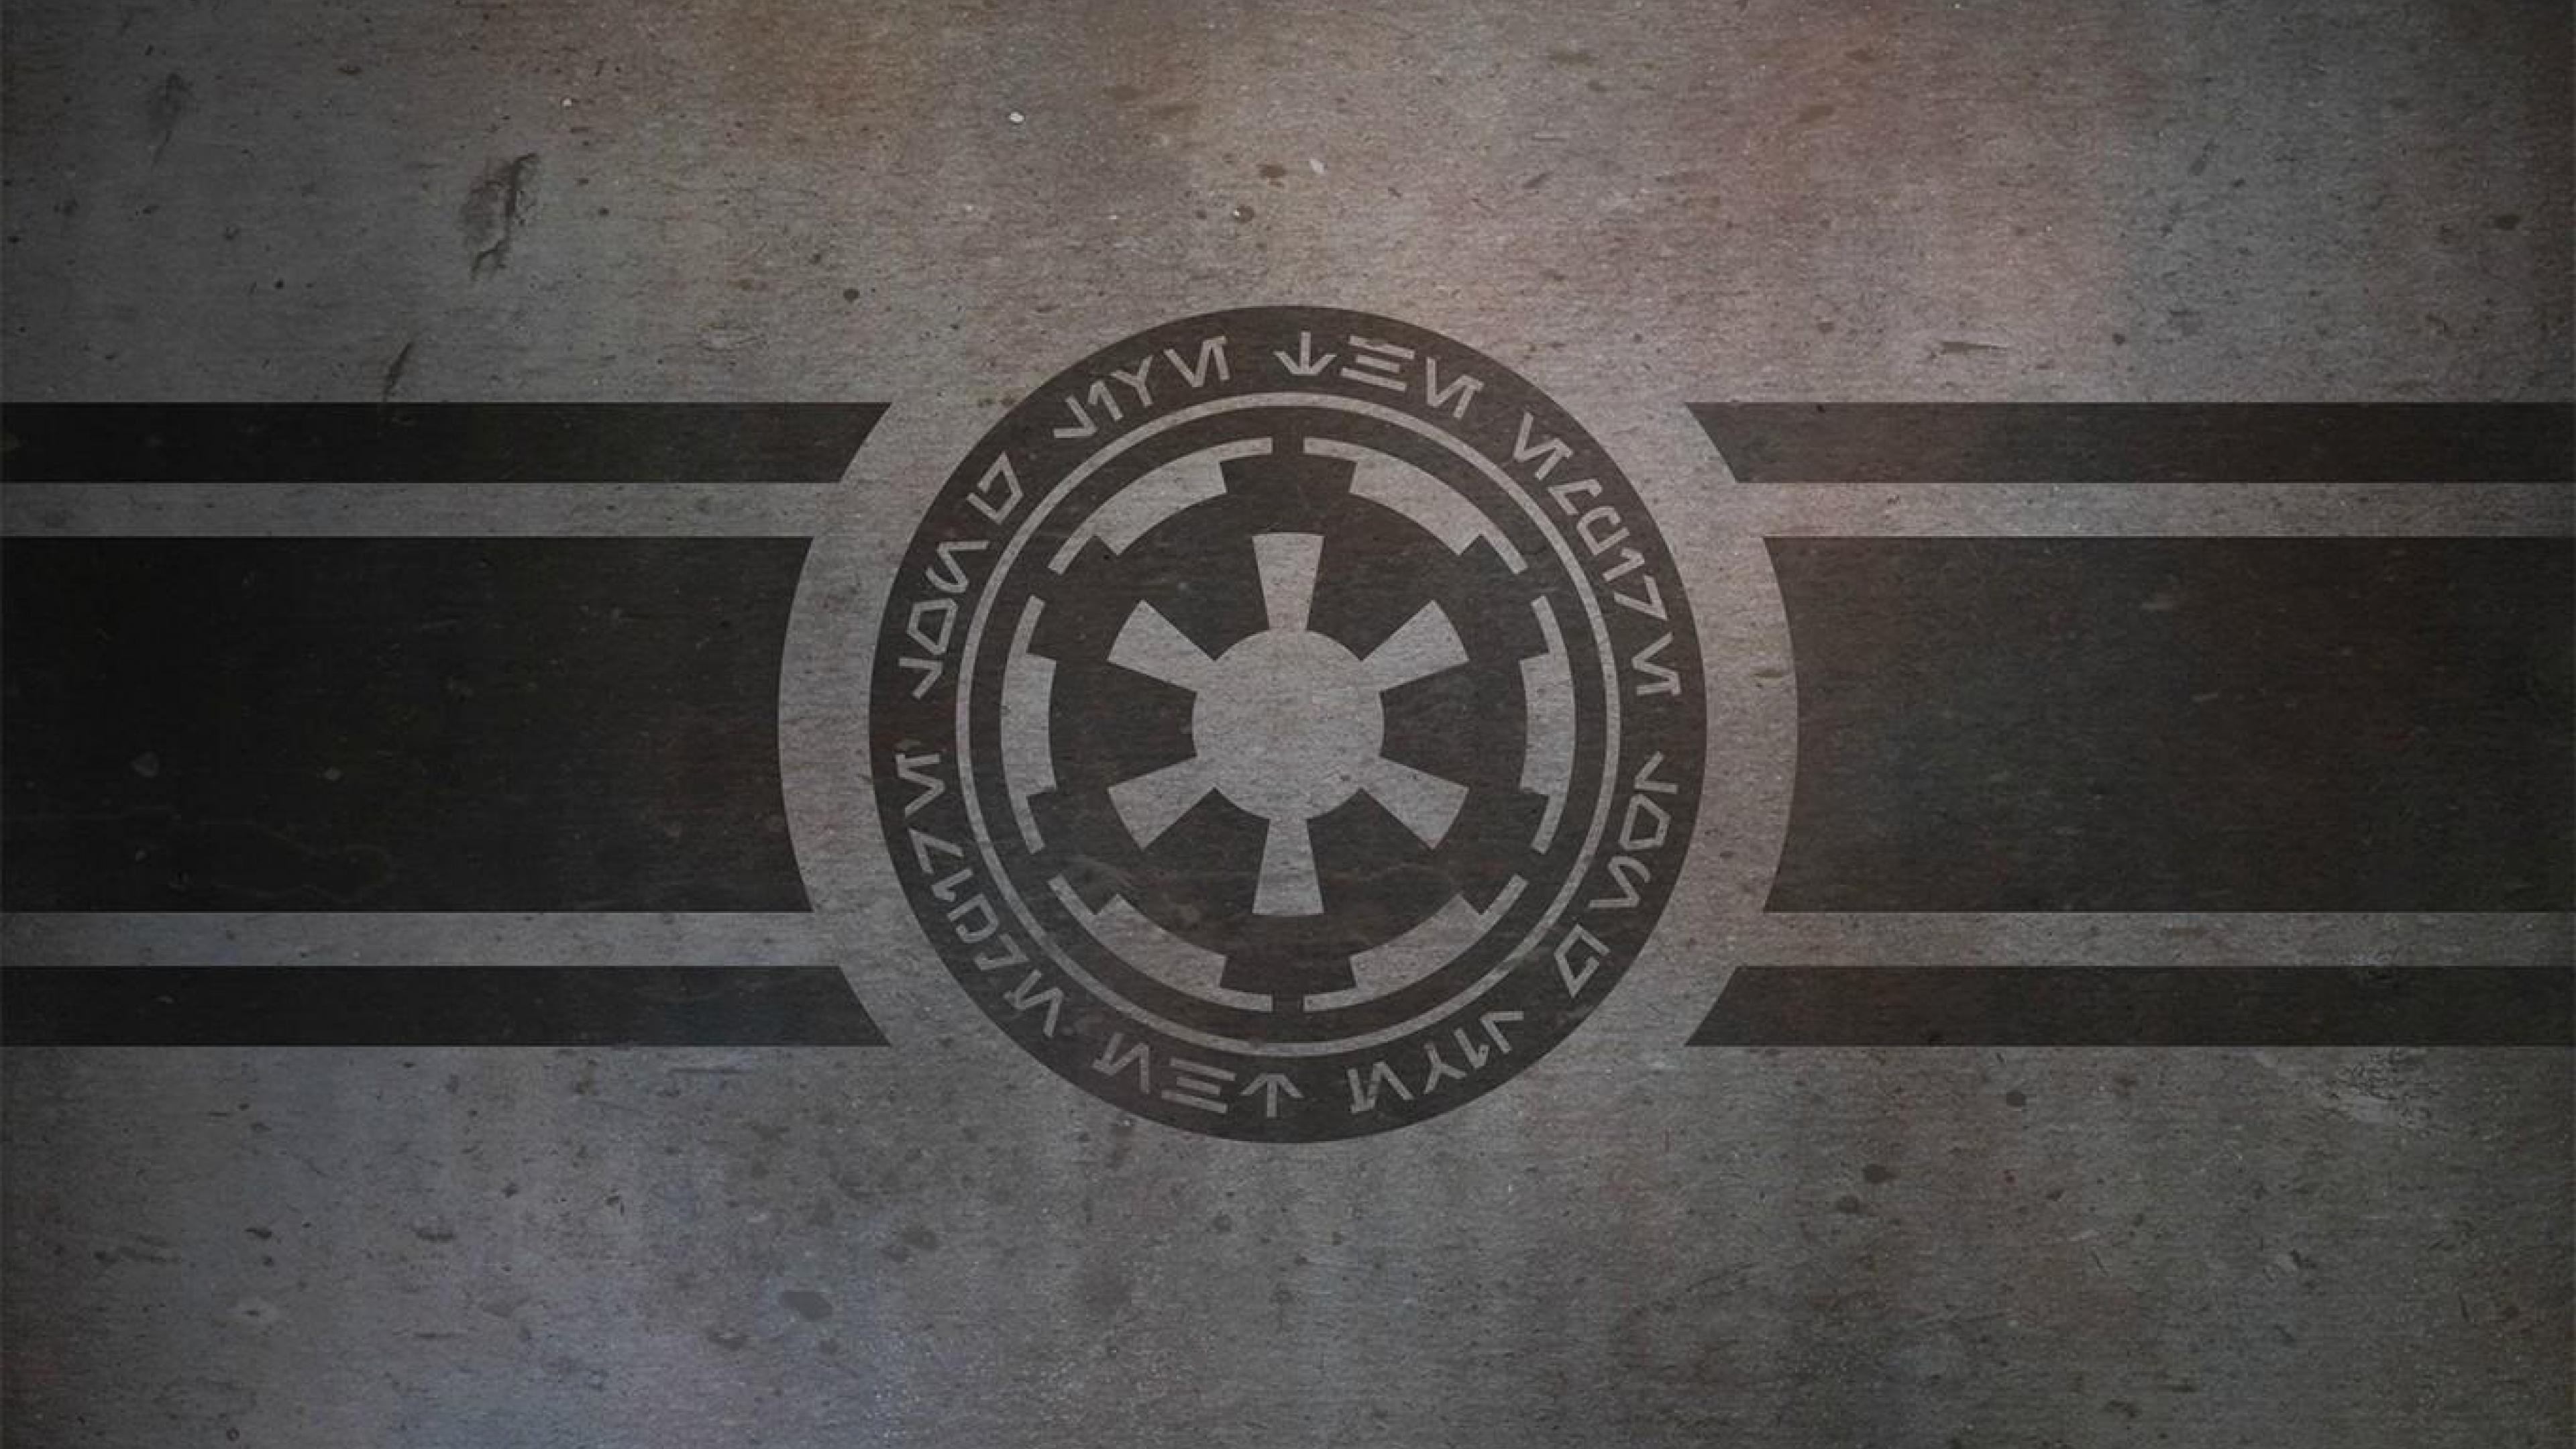 Galactic Empire Wallpapers On Wallpaper Hd 3840 x 2160 px 2.43 MB fleet jedi  order hd